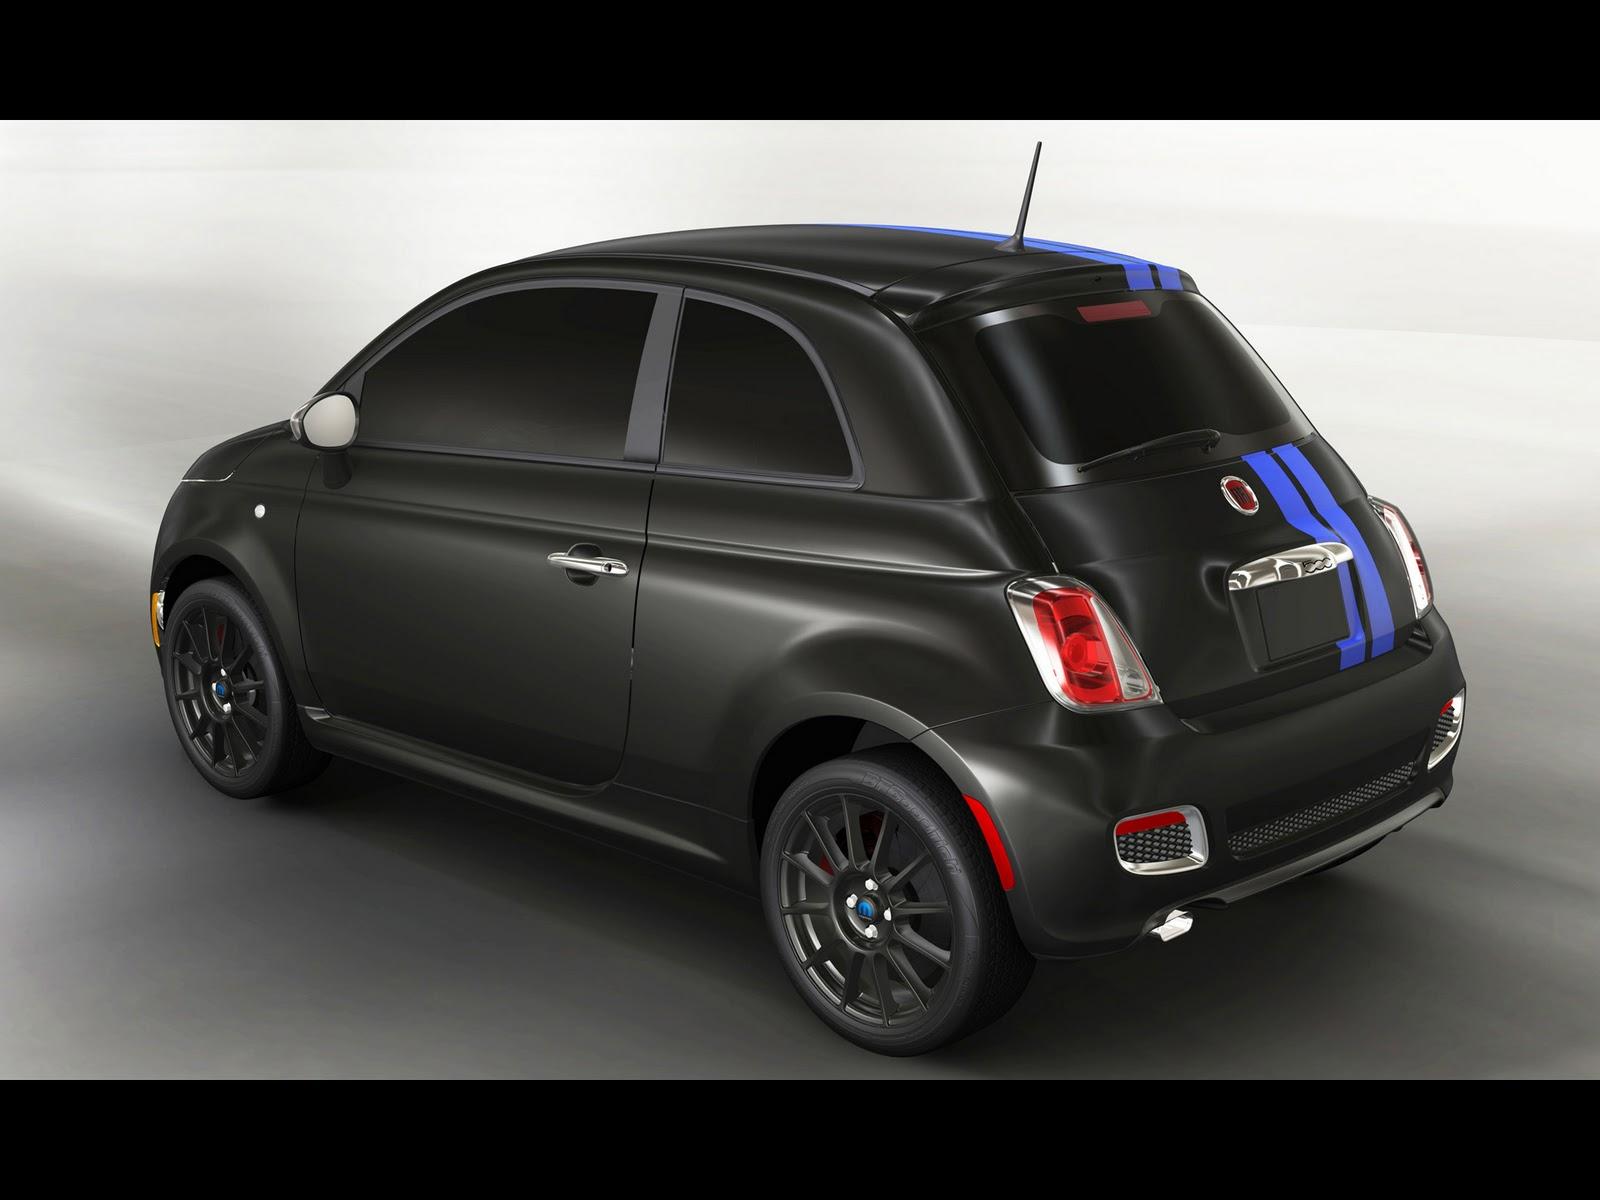 http://2.bp.blogspot.com/_viCh1SFyGrA/TUEzJ1EyJ9I/AAAAAAAAARU/NW3x5NSdrA0/s1600/2012-Fiat-500-by-Mopar-Rear-And-Side-2-1920x1440.jpg